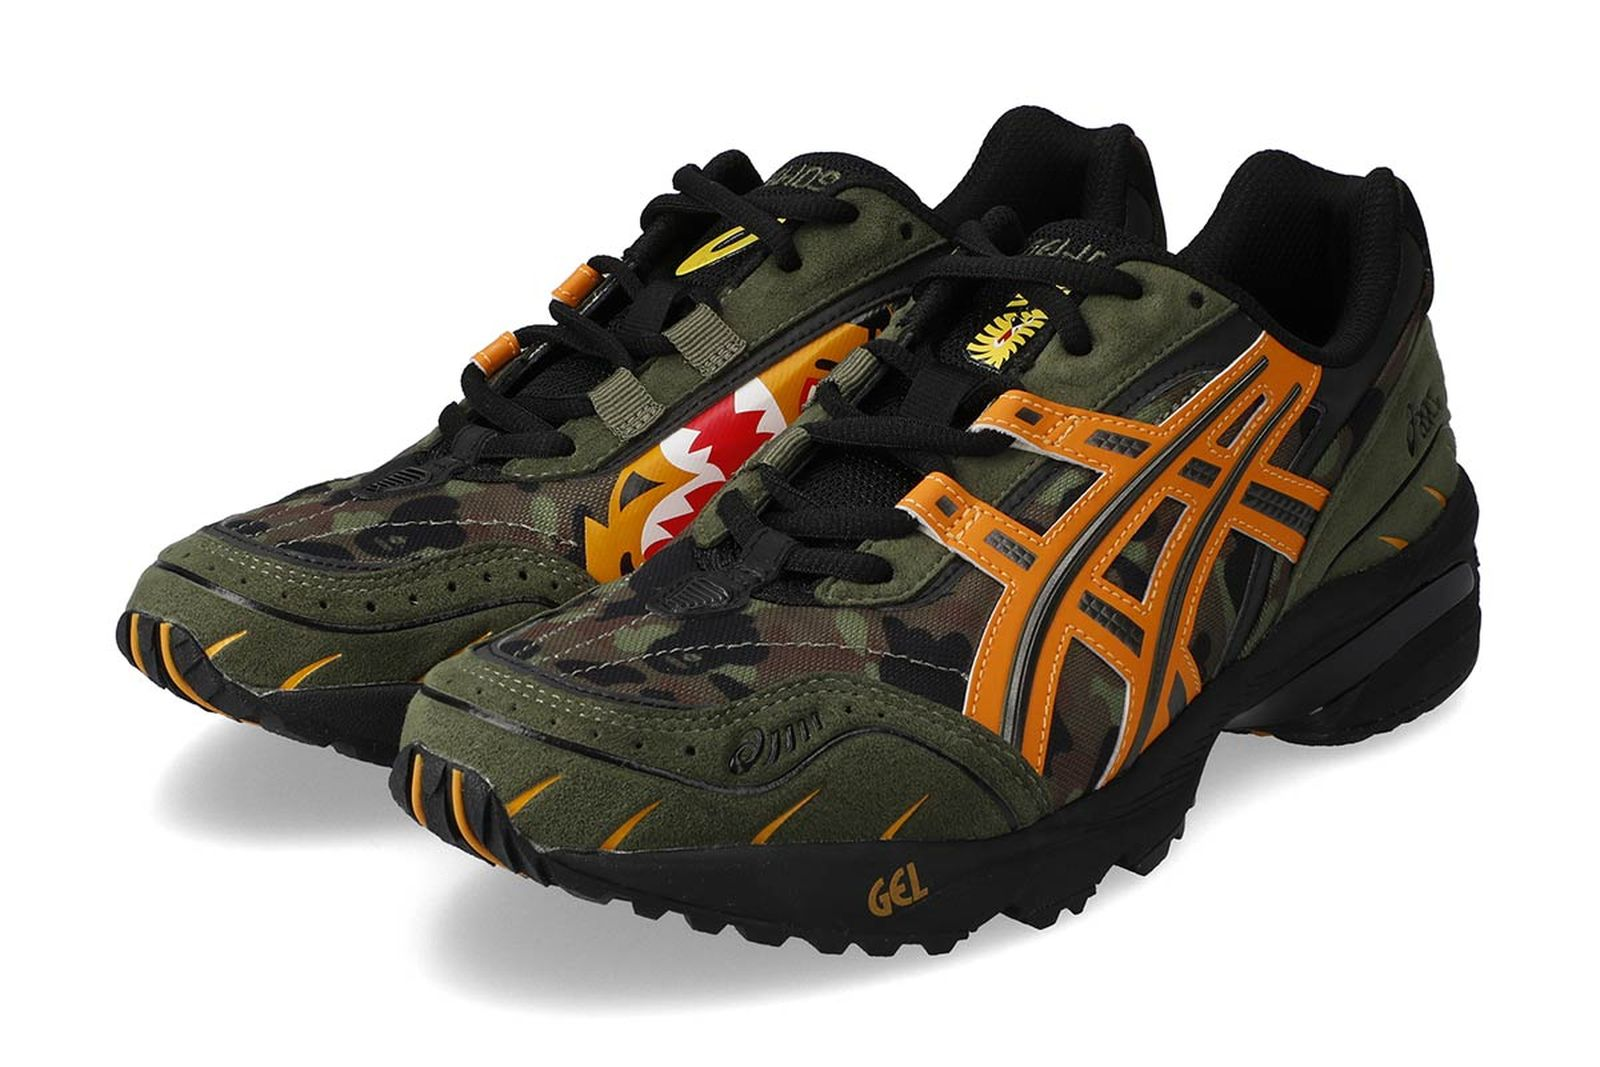 bape-asics-gel-1090-sneaker-collab-release-date-info-price-buy- (4)